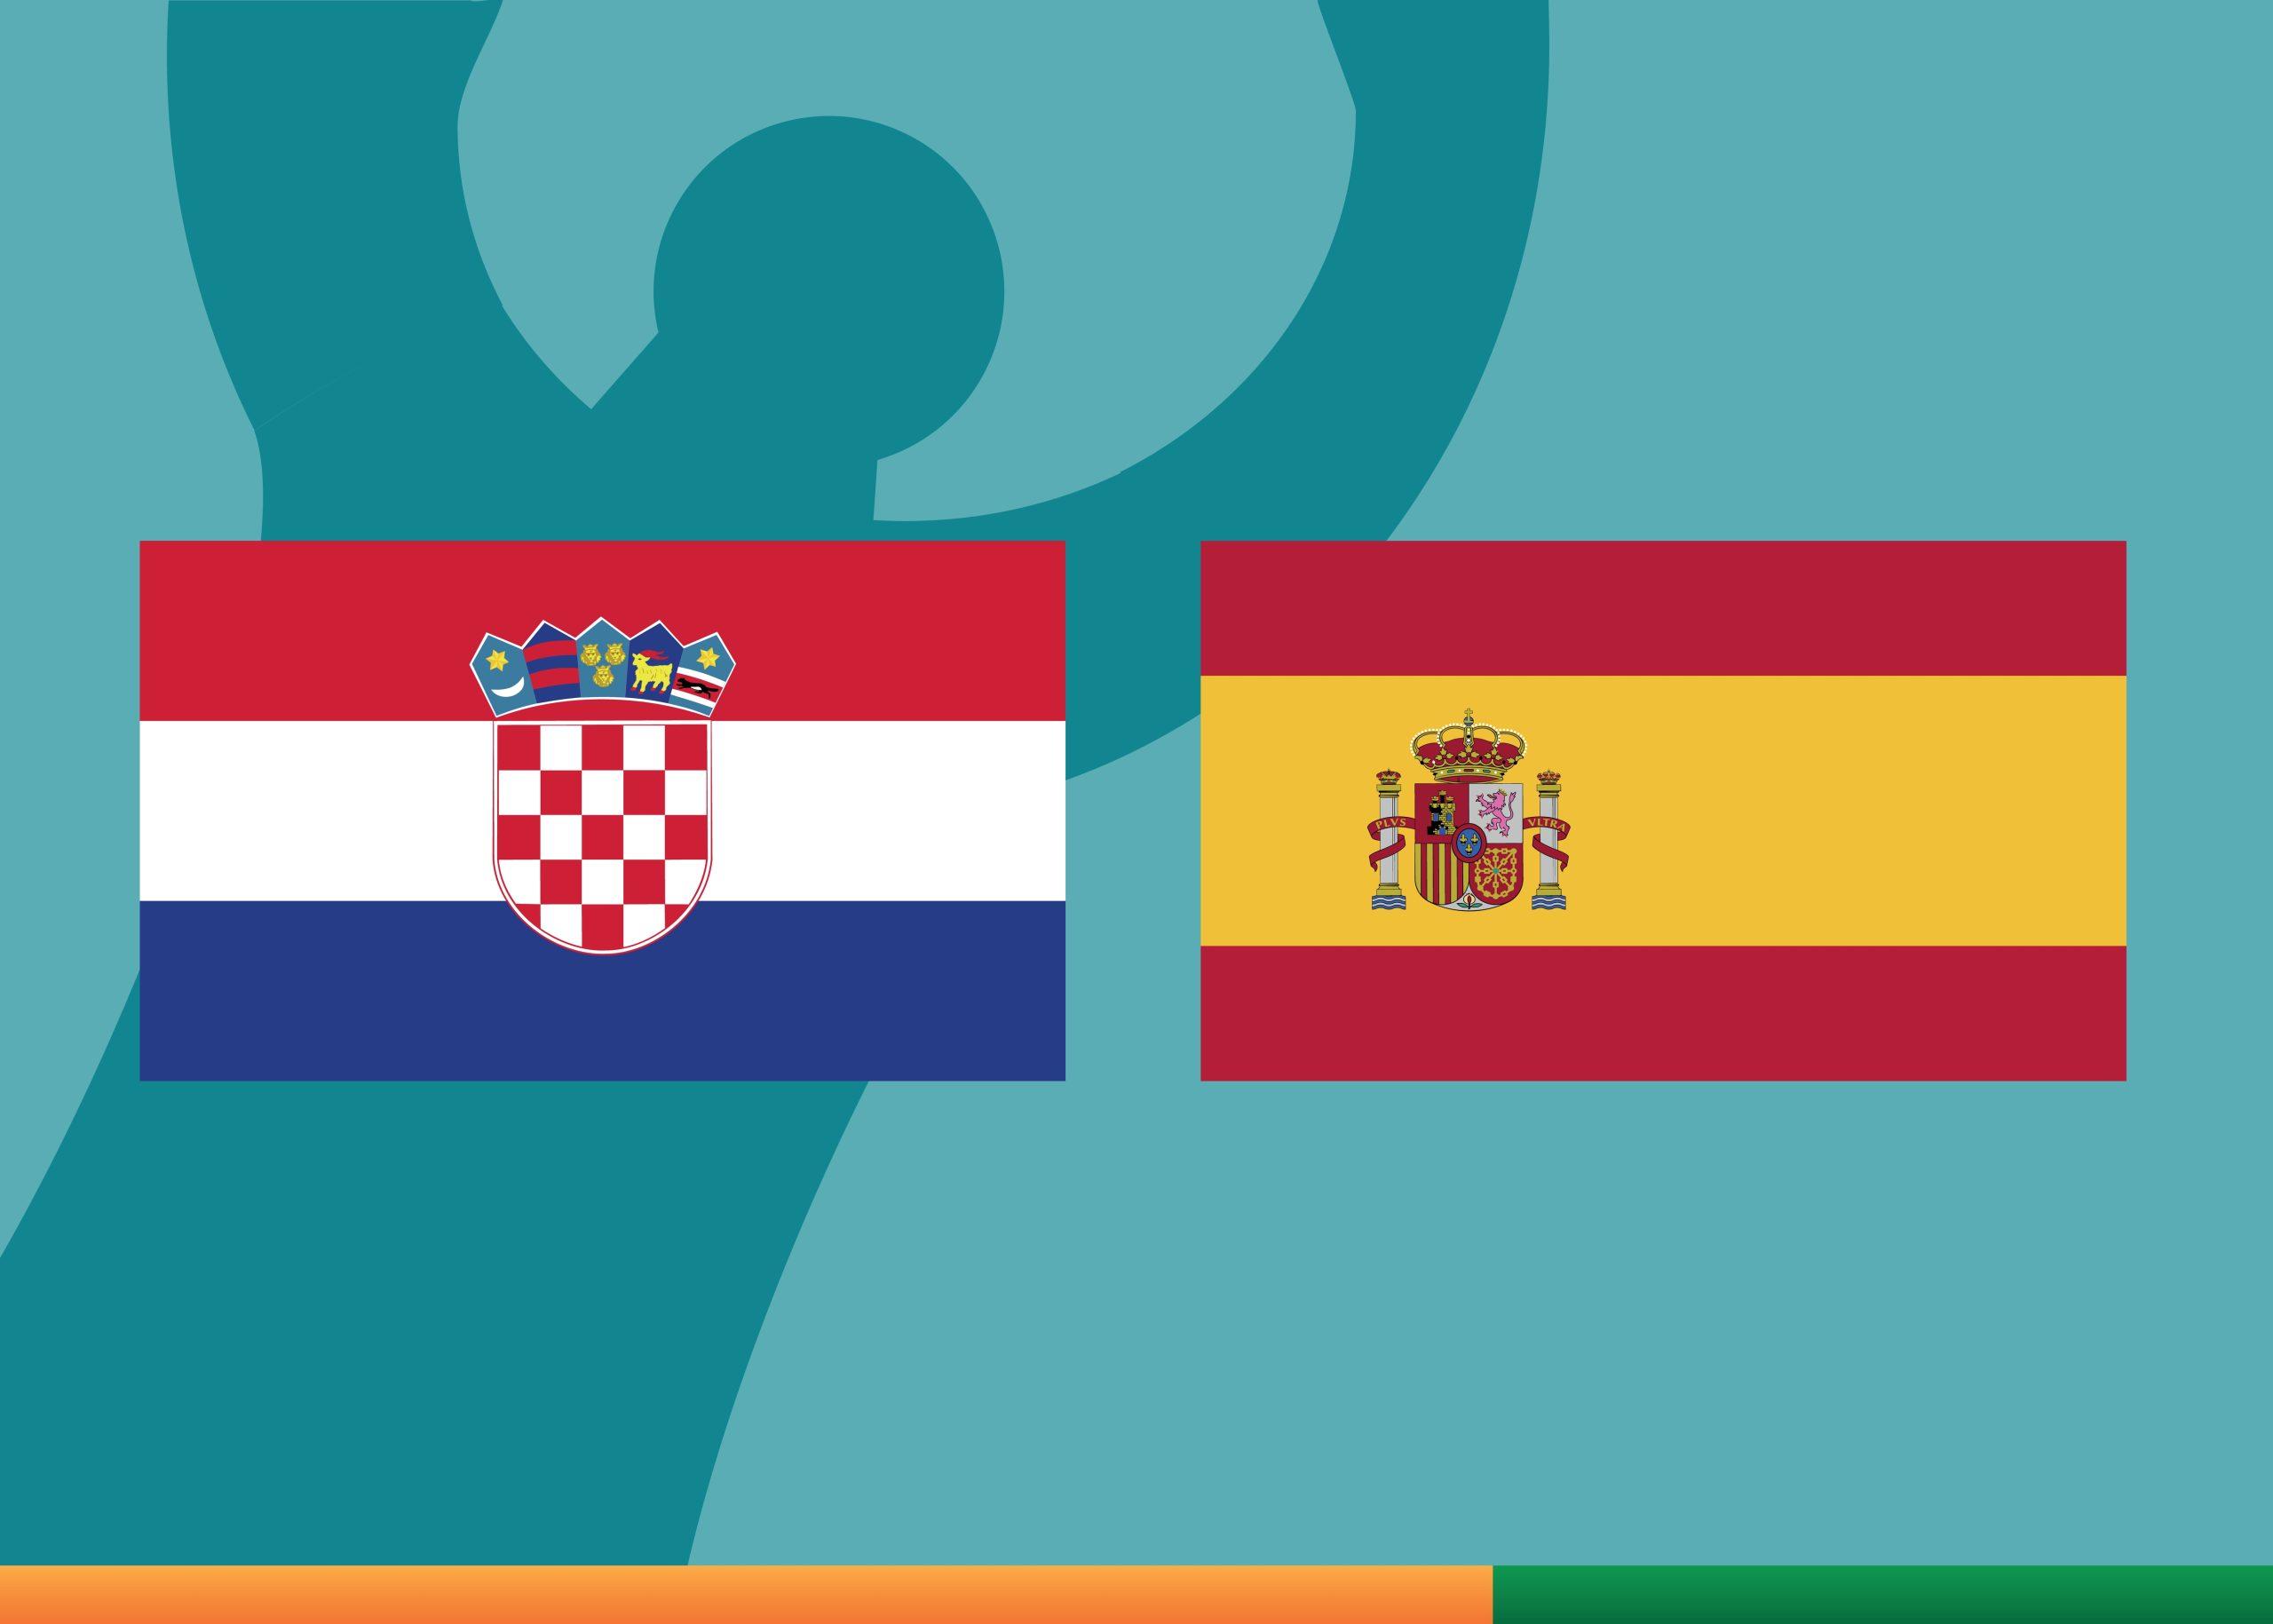 Croatia vs Spain Euro 2020